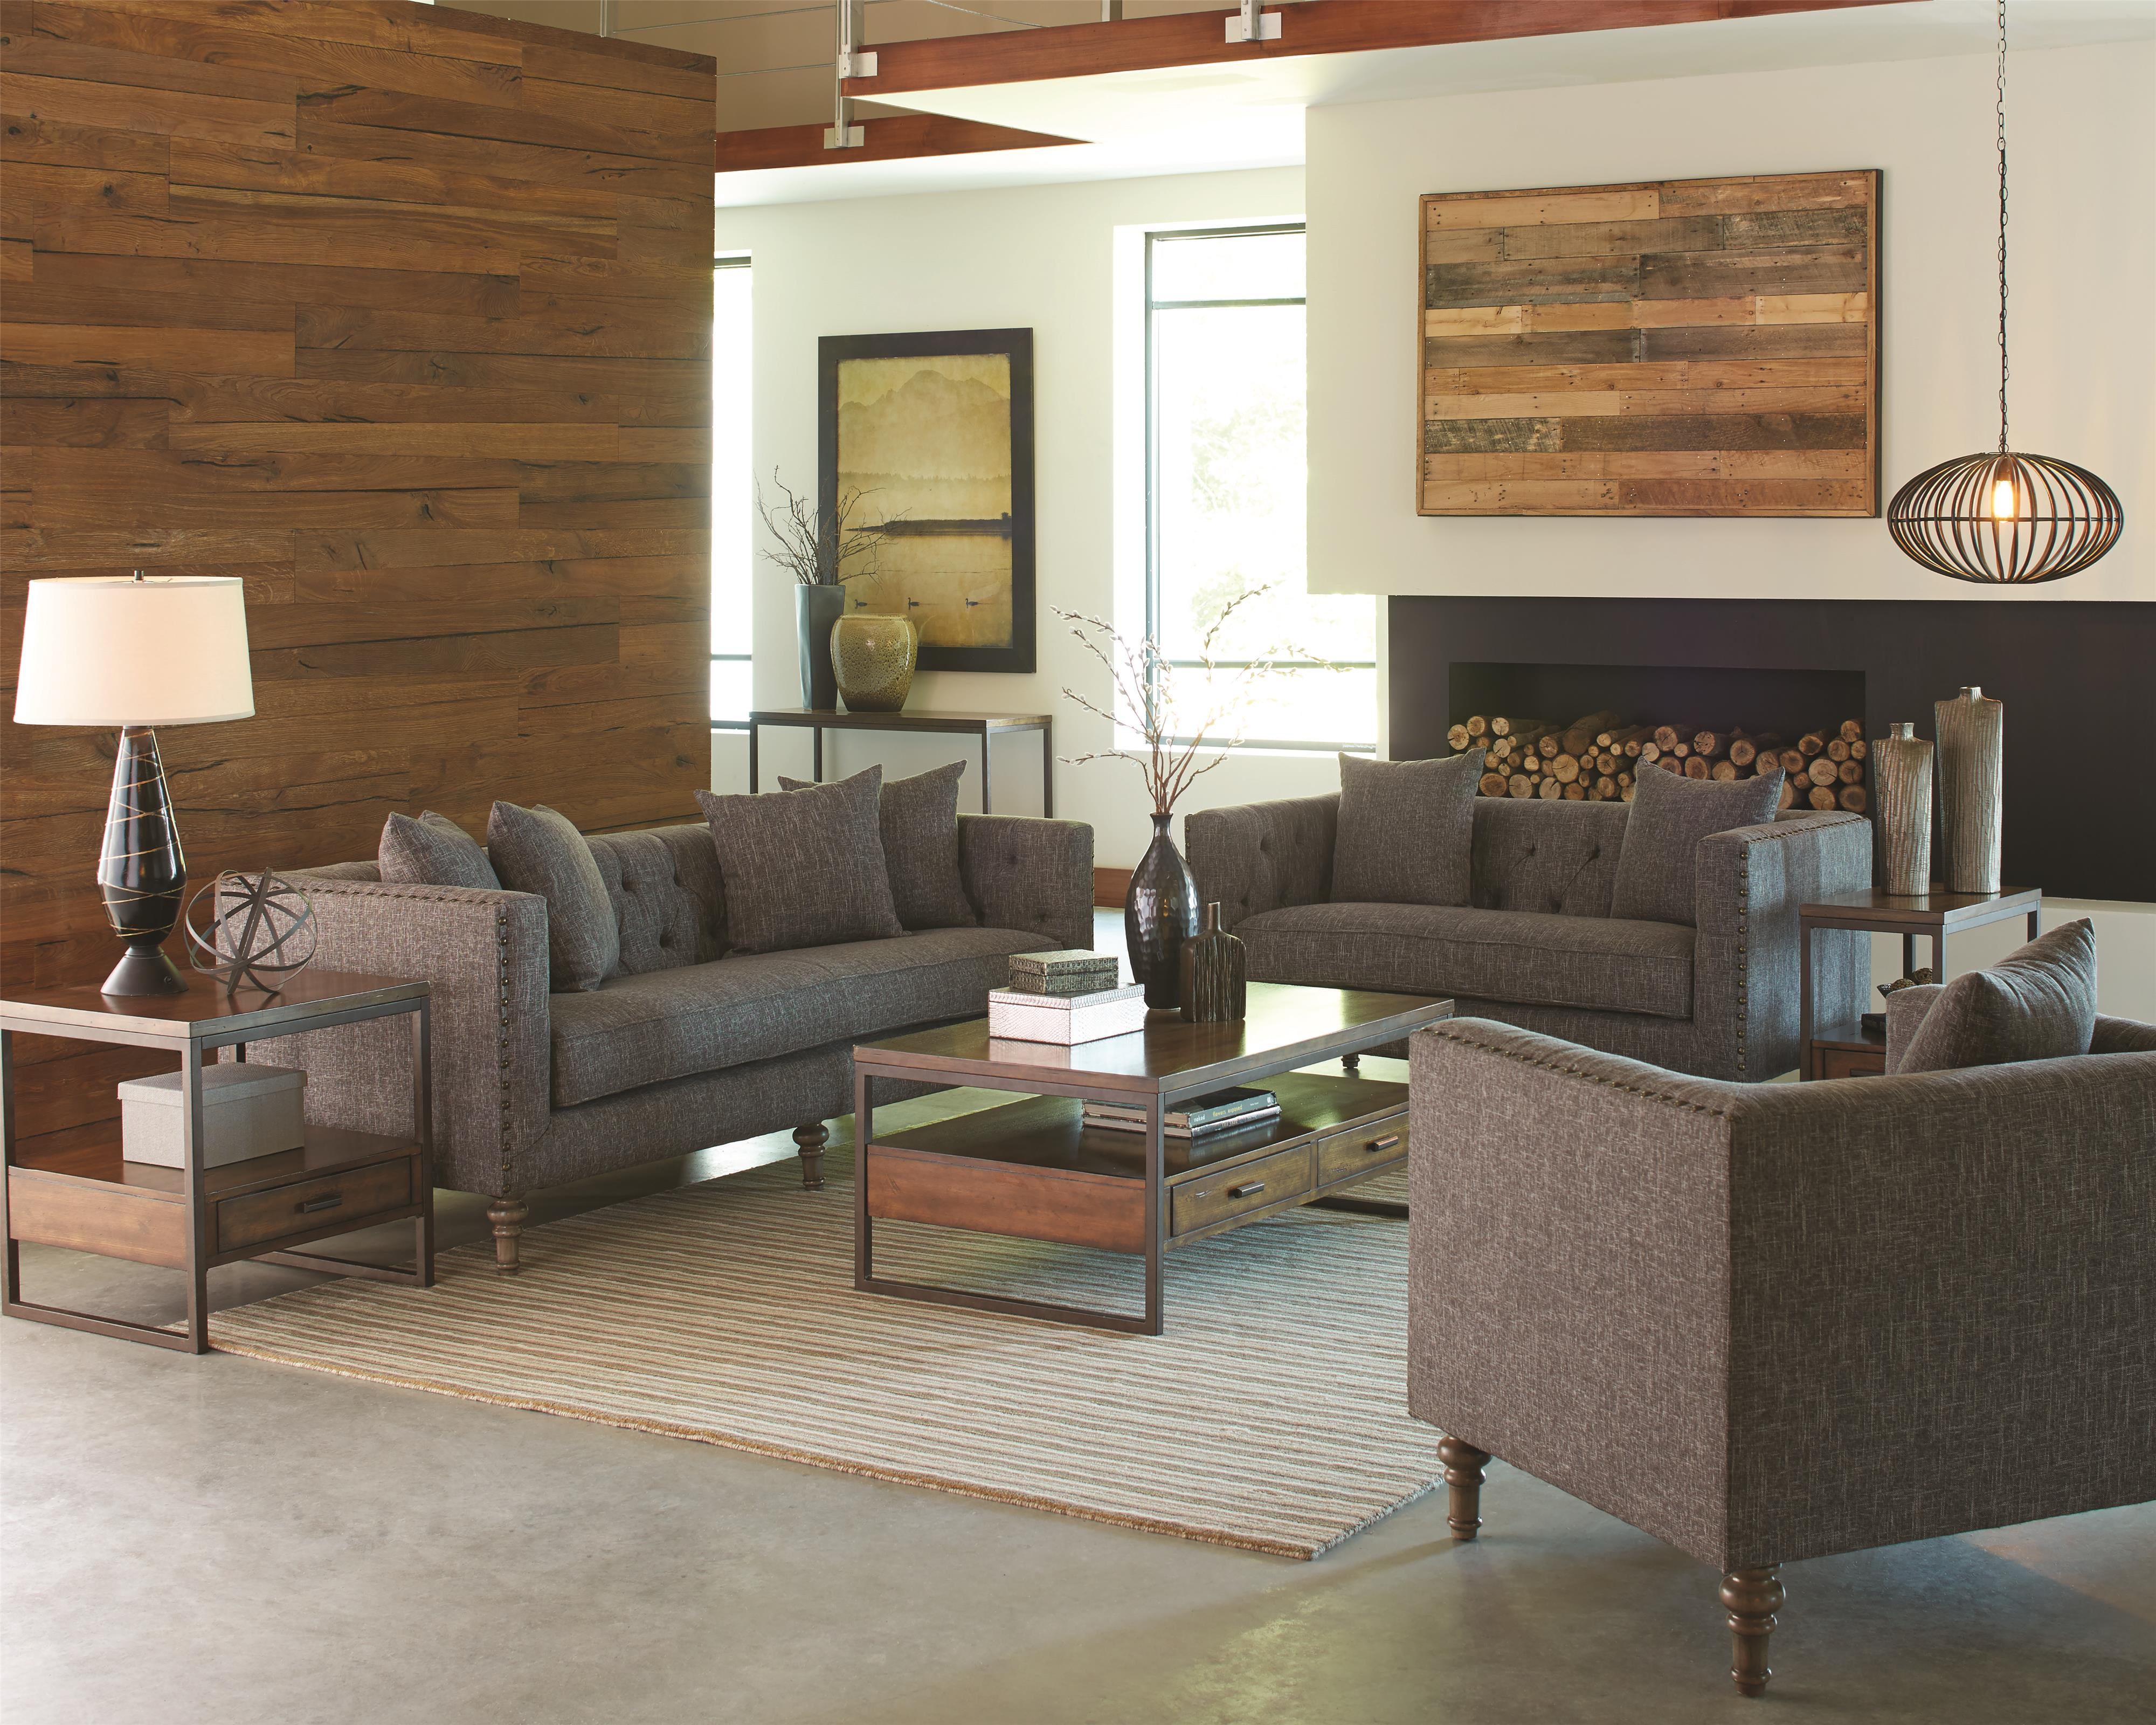 Coaster Ellery 505771 Sofa | Northeast Factory Direct | Sofas Cleveland,  Eastlake, Westlake, Mentor, Medina, Ohio